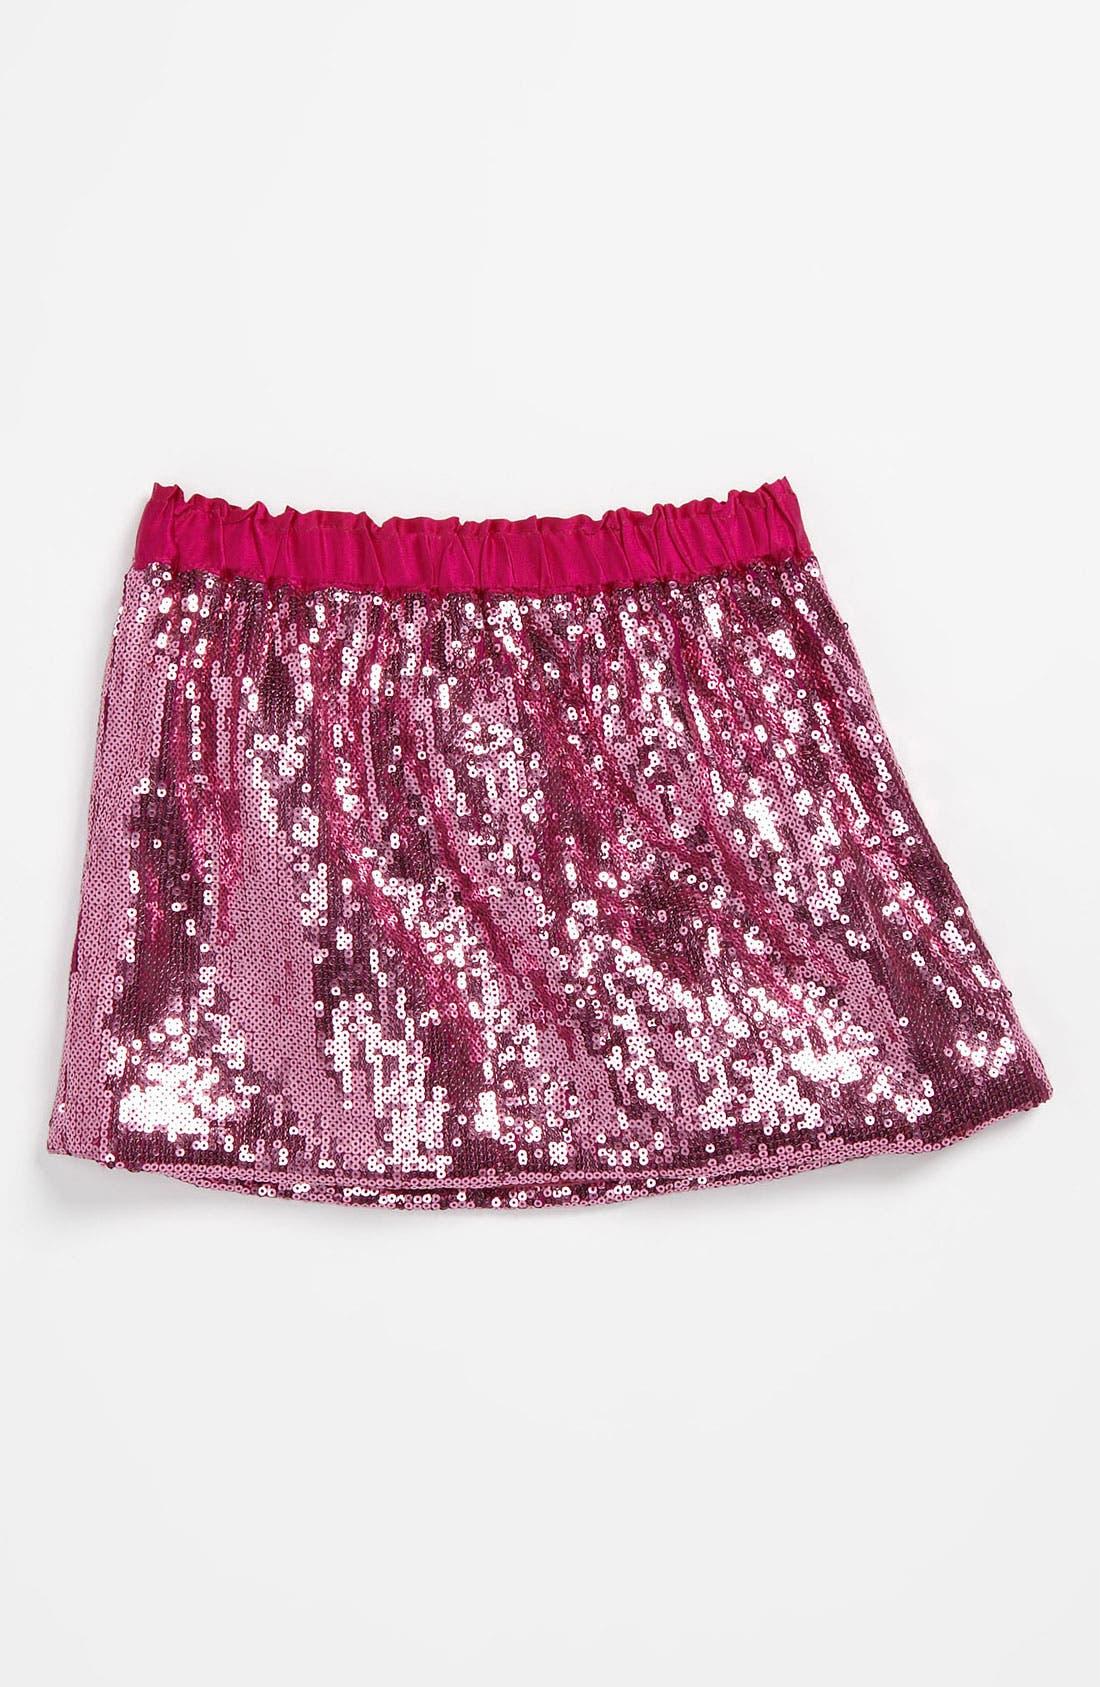 Alternate Image 1 Selected - Curio+Kind Sparkle Skirt (Toddler)